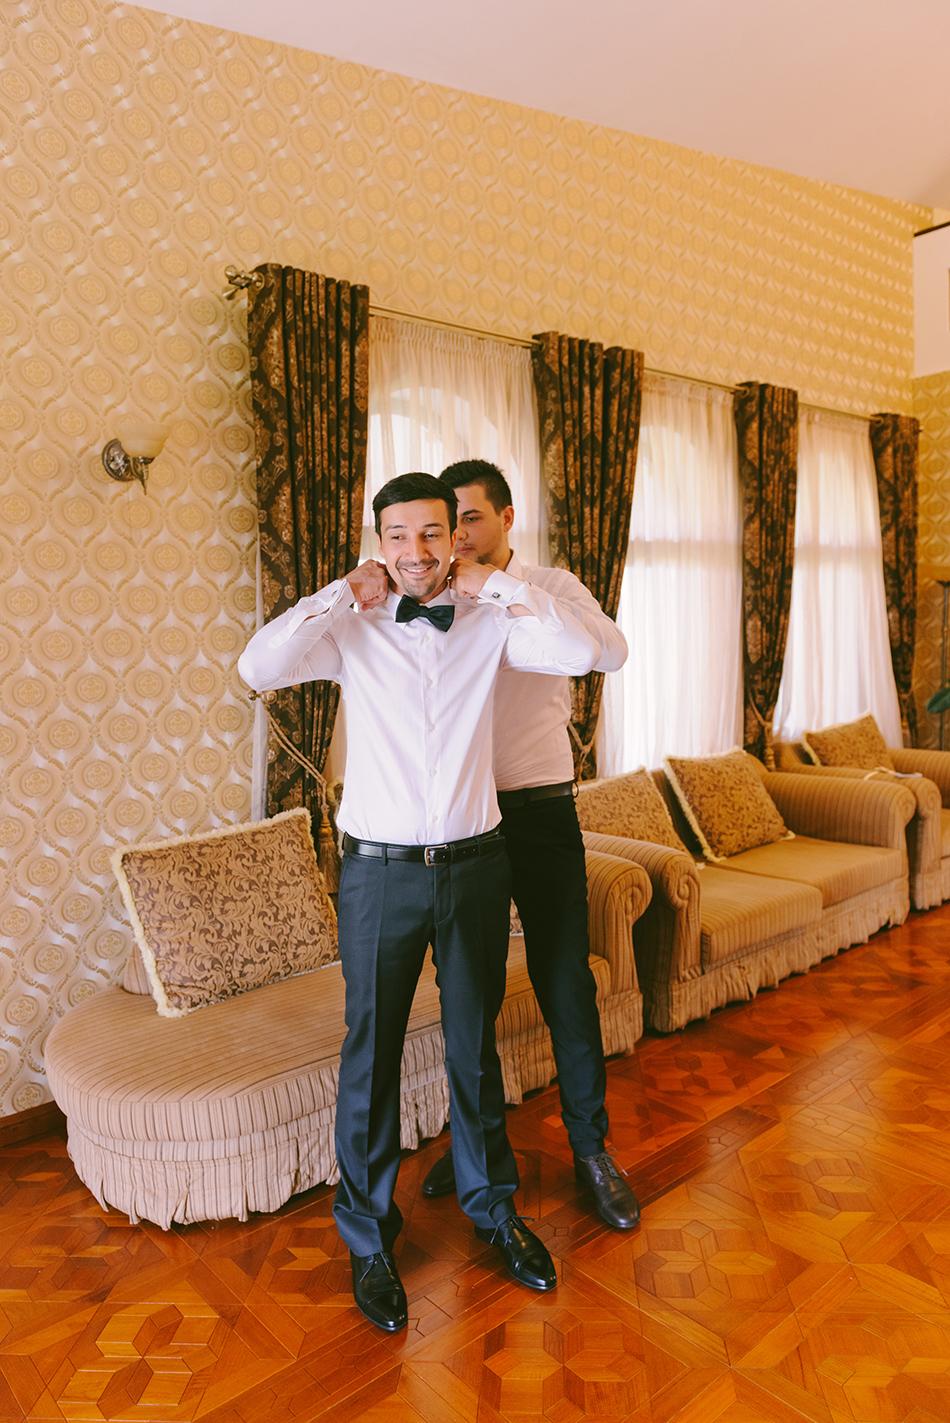 AD Passion Photography | fotograf-nunta-brasov-poiana-brasov-fotograf-profesionist_lorena-cristi_0008 | Adelin, Dida, fotograf profesionist, fotograf de nunta, fotografie de nunta, fotograf Timisoara, fotograf Craiova, fotograf Bucuresti, fotograf Arad, nunta Timisoara, nunta Arad, nunta Bucuresti, nunta Craiova